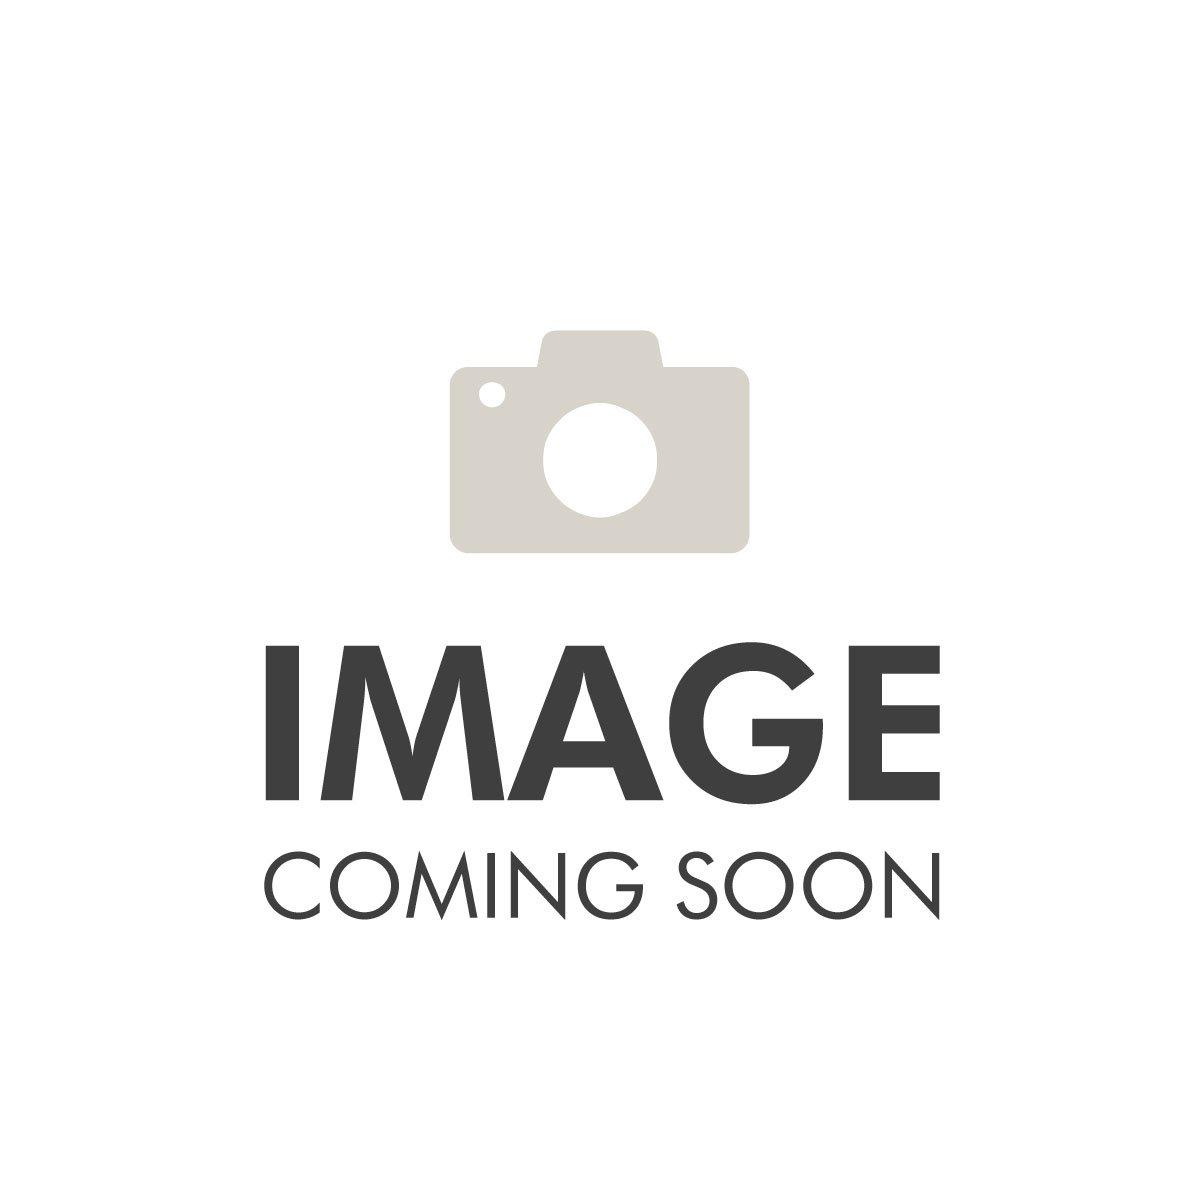 Dolce & Gabbana Dolce And Gabbana Light Blue Love In Capri EDT Spray 25ml